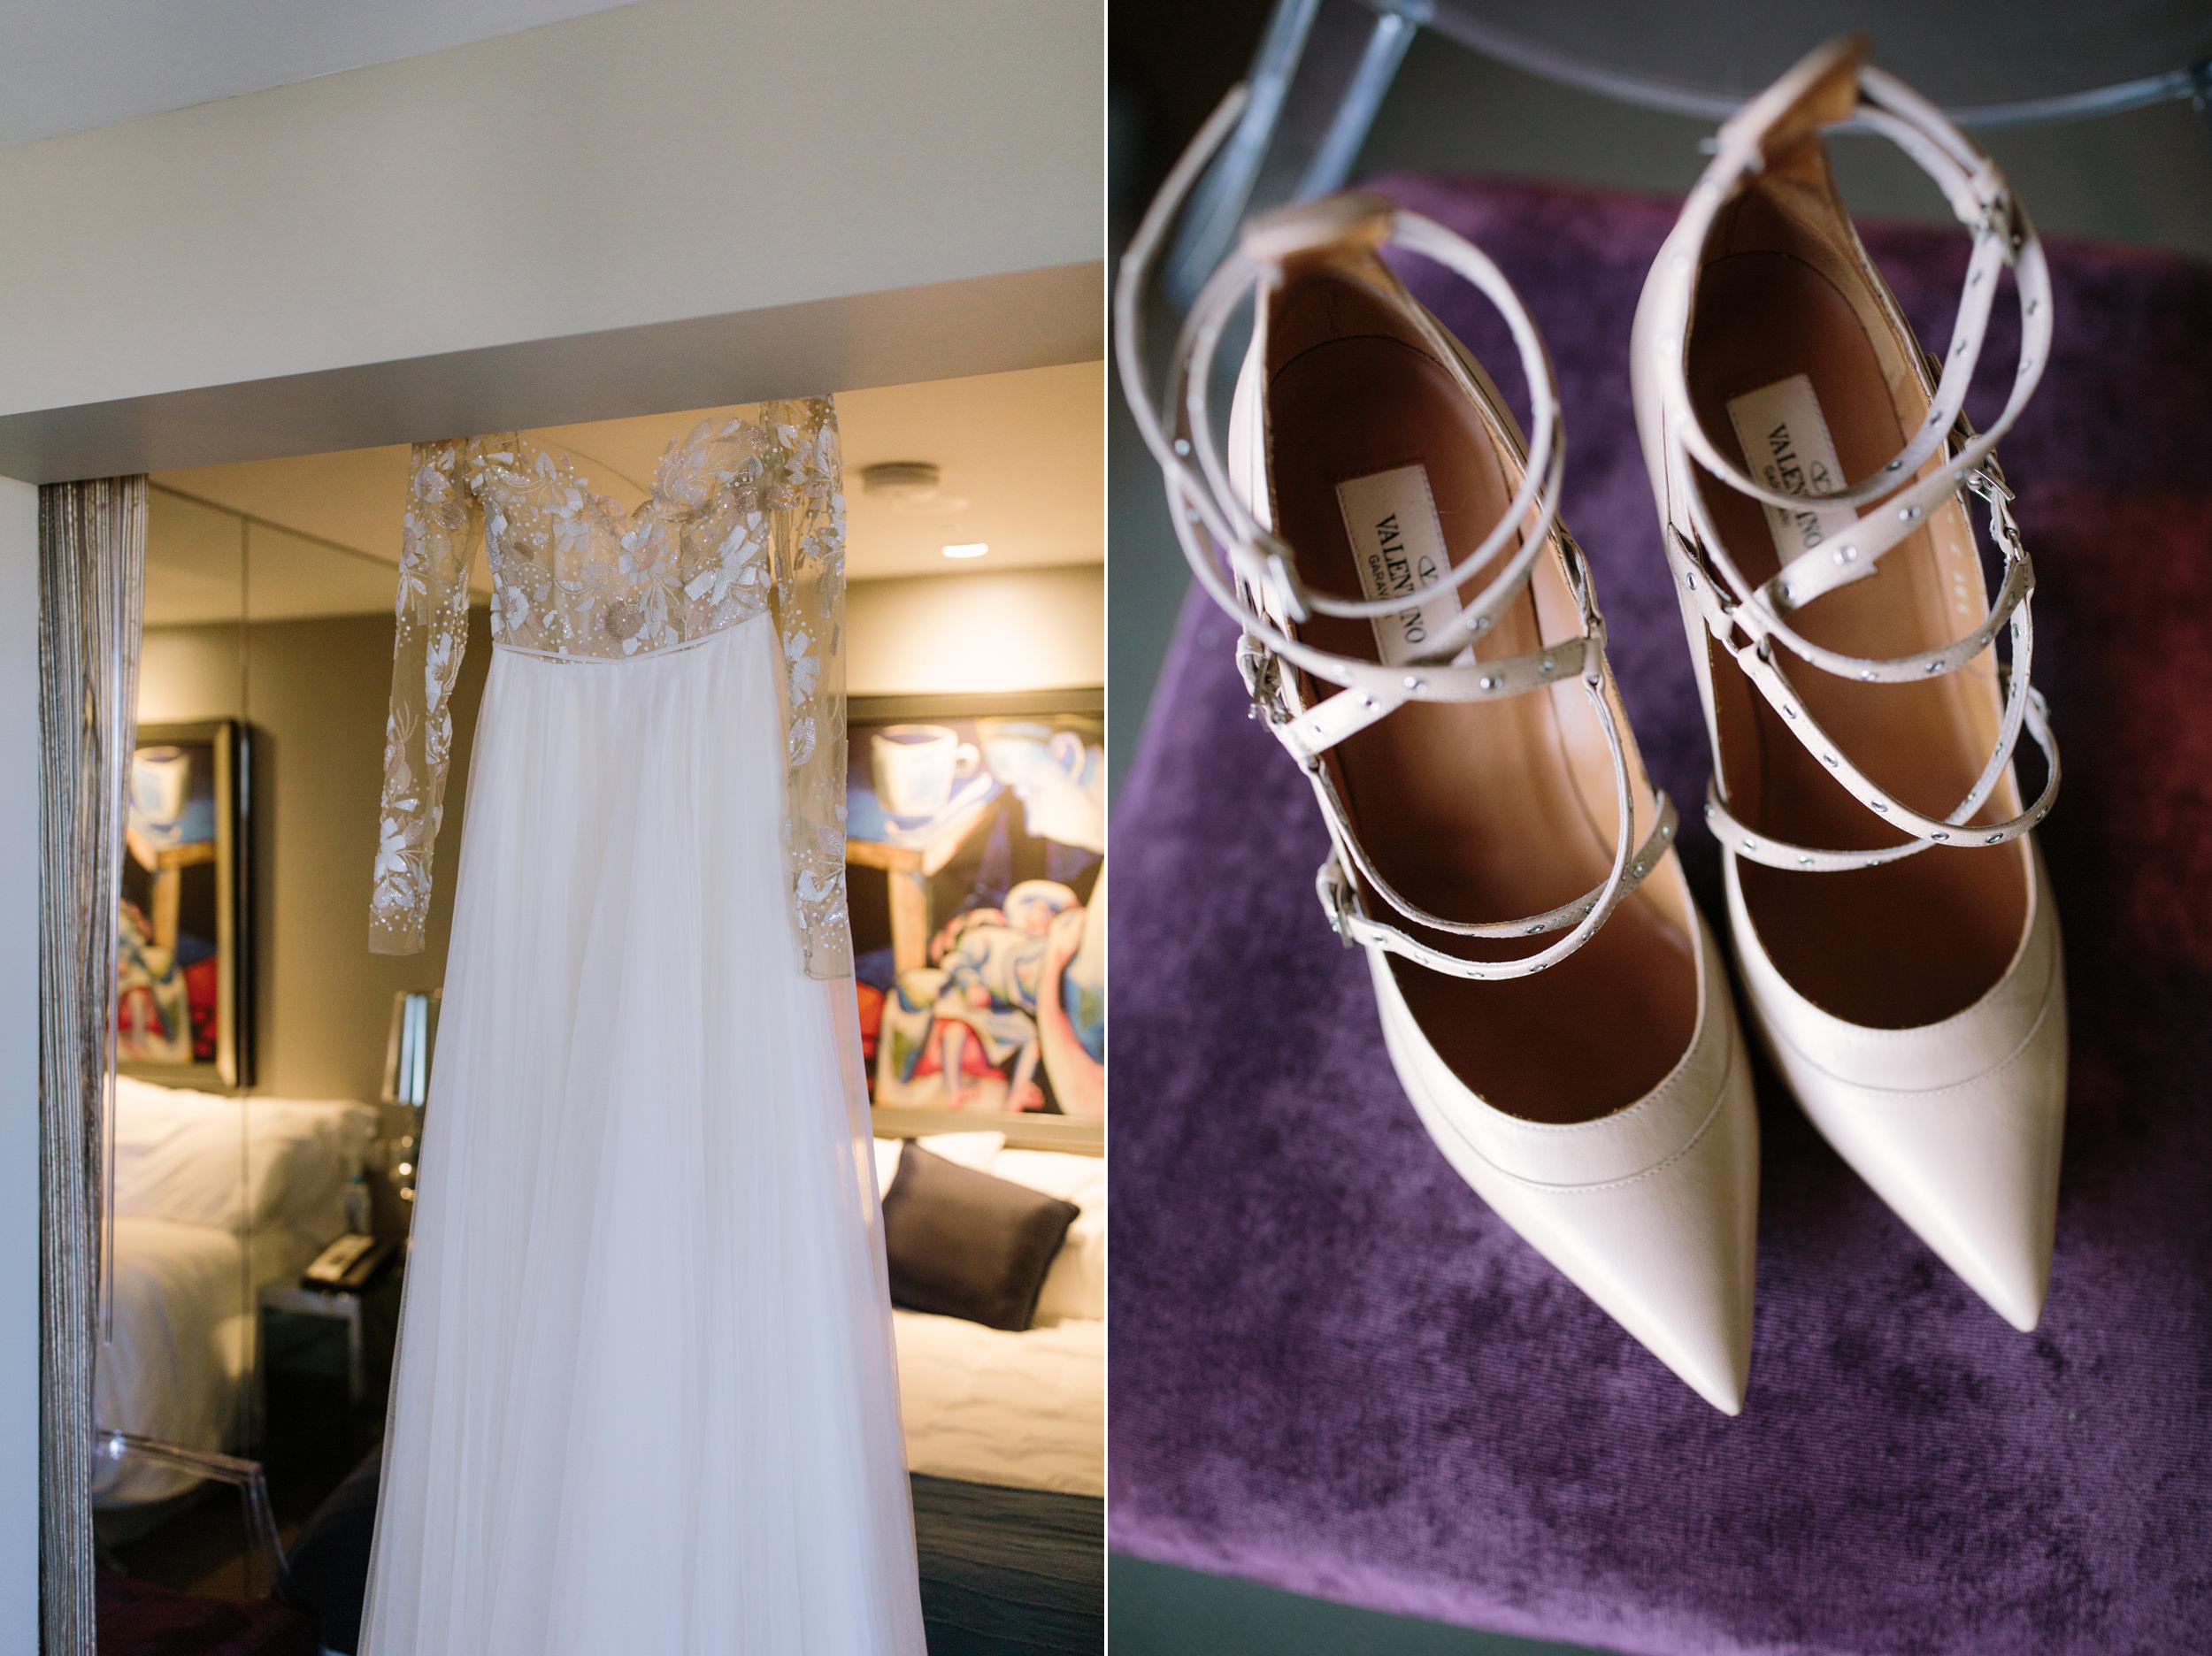 I-Got-You-Babe-Weddings-Hayley-Sam-NGV-Melbourne0002.JPG